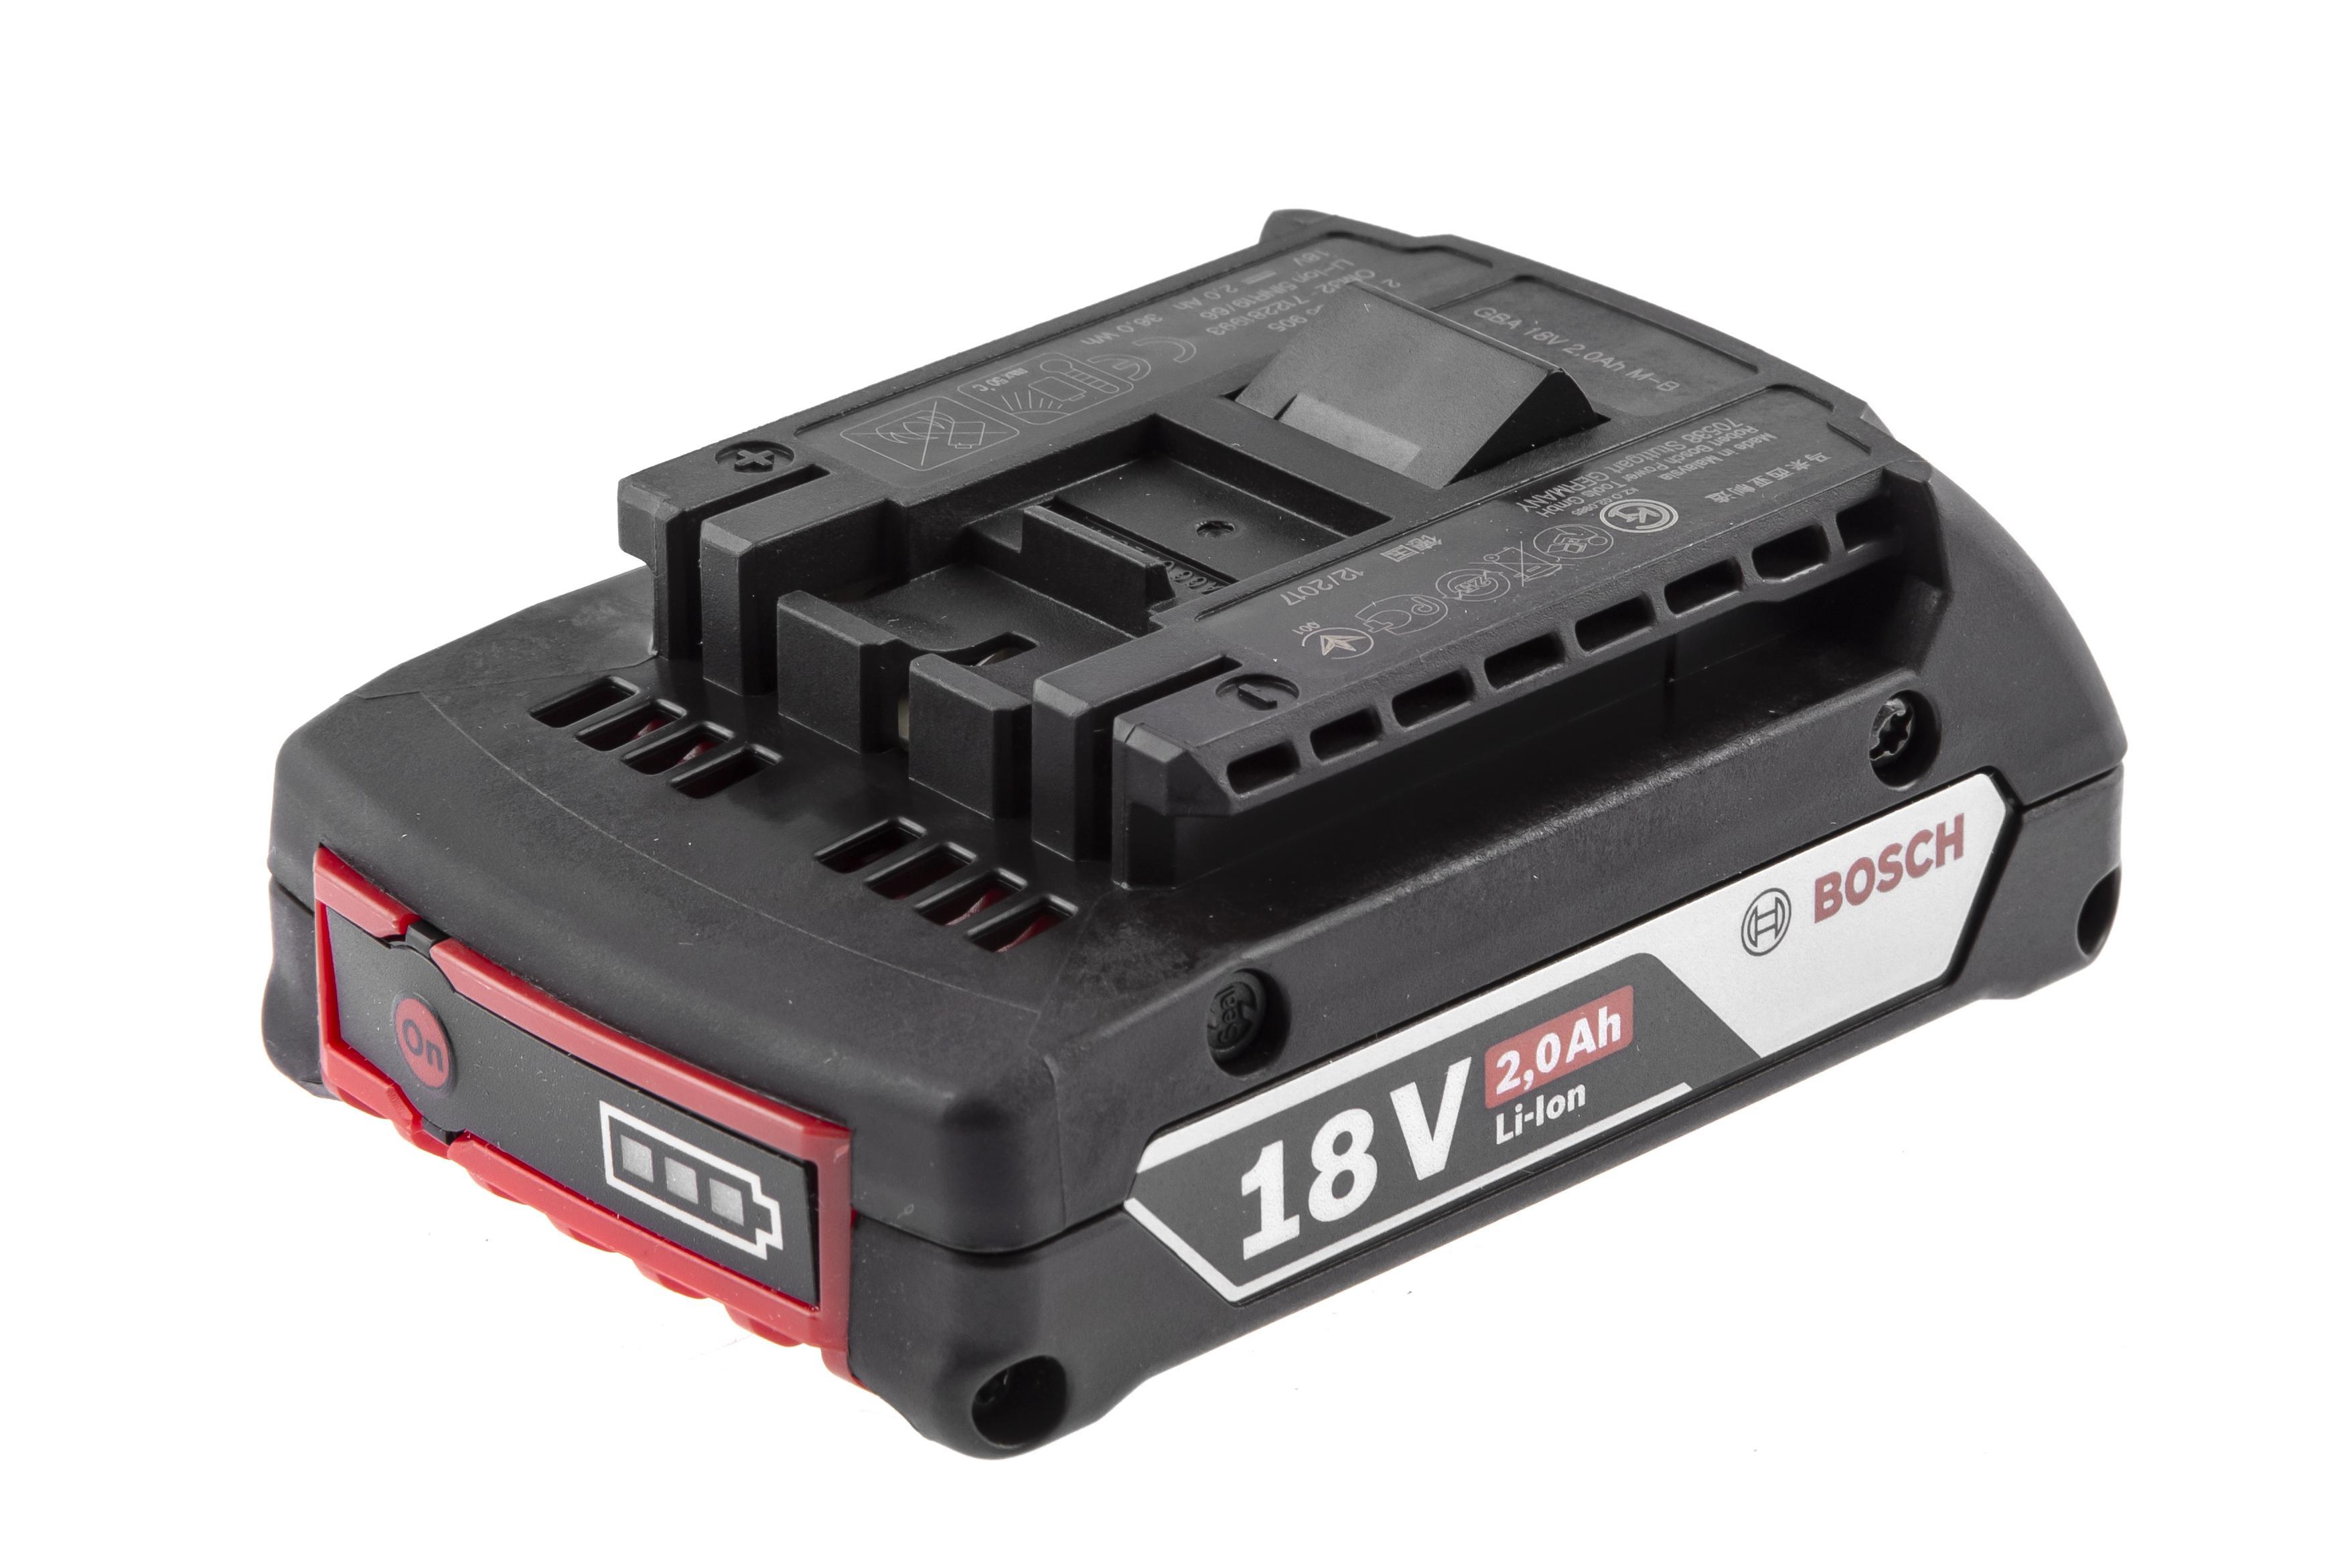 Аккумулятор Bosch 18В 2Ач li-ion (1600z00036) аккумулятор bosch pba 18в 2 5 ач w b